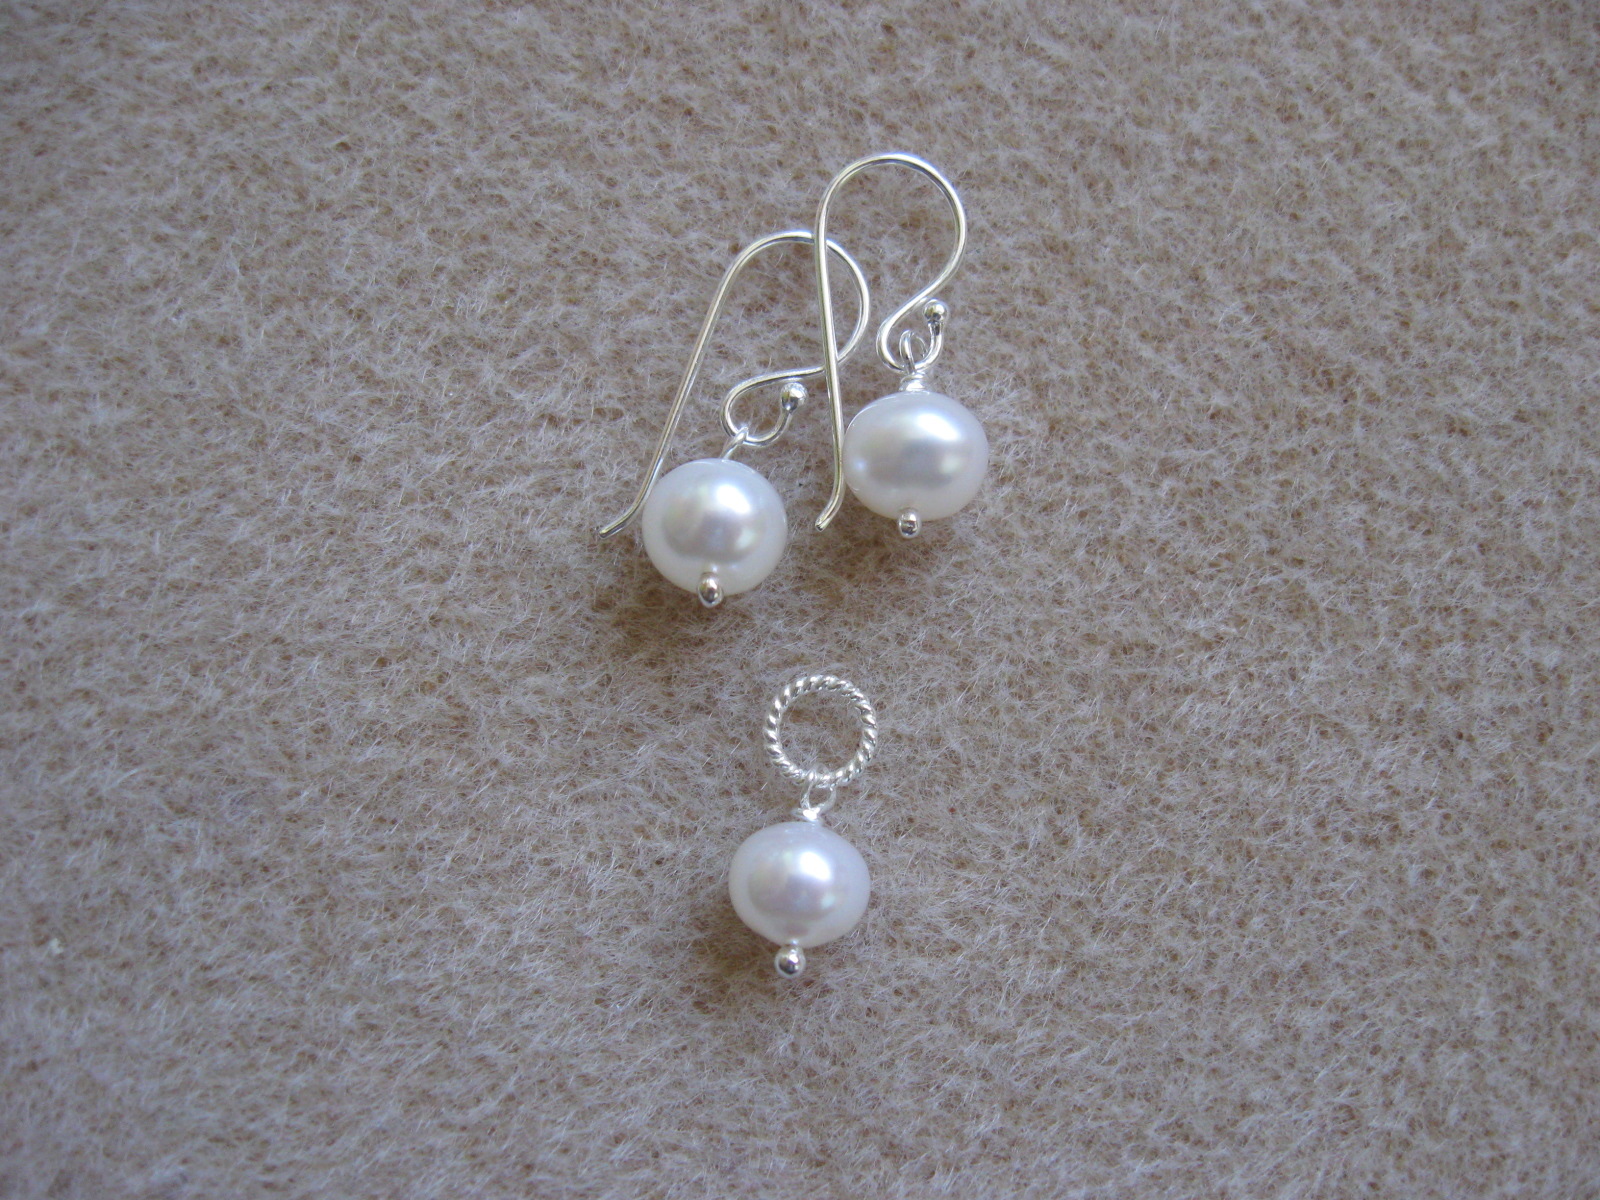 Freshwater pearls earrings and pendant set